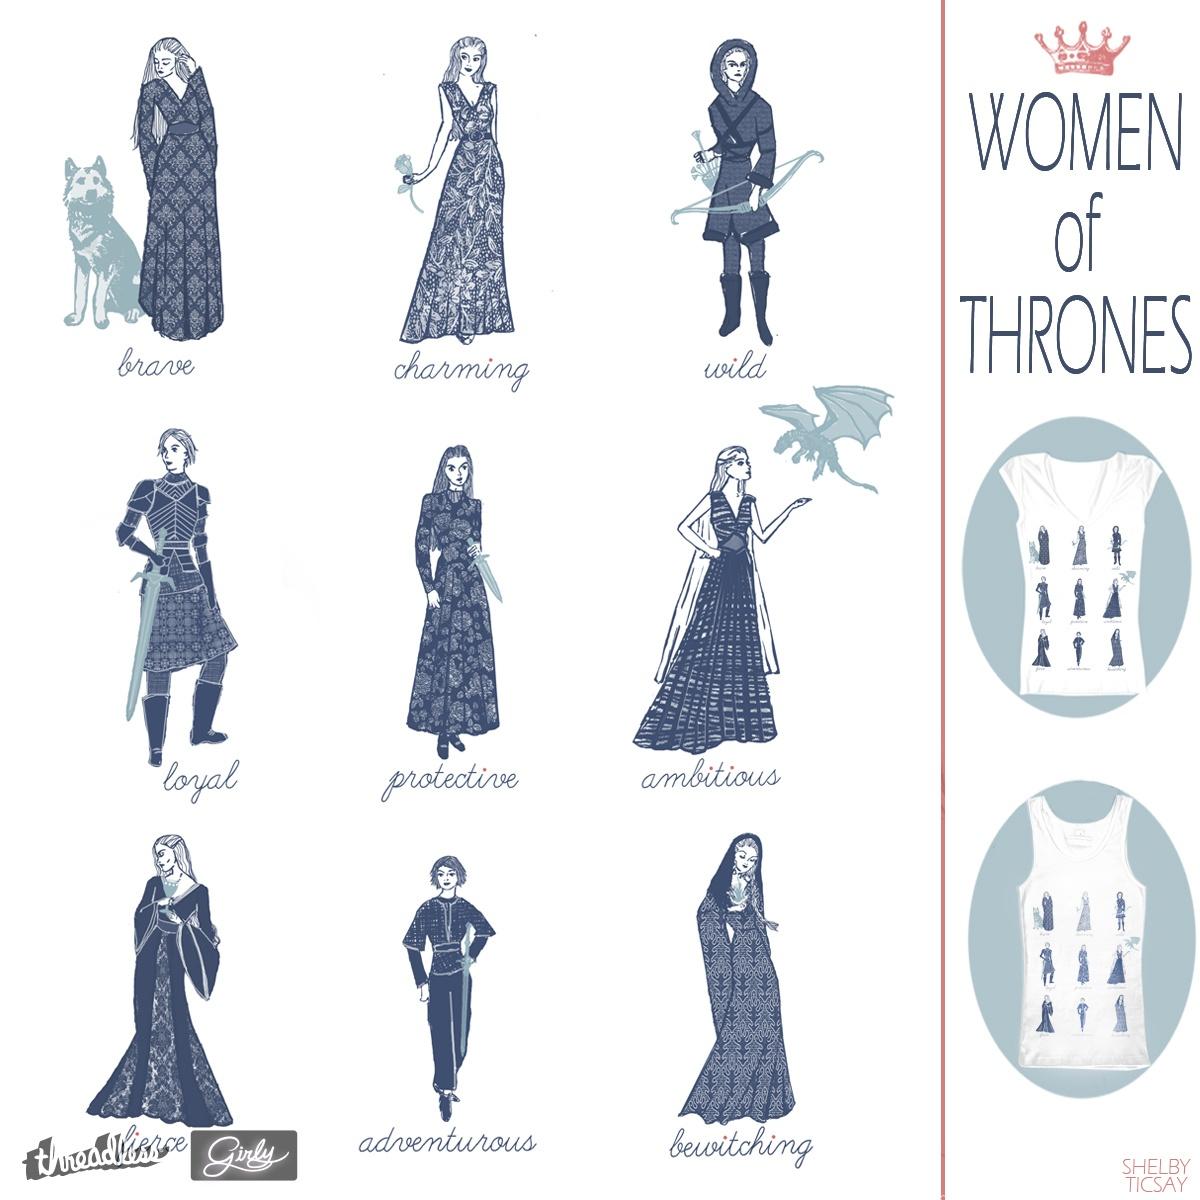 Women of Thrones by LunaMeadowlark on Threadless